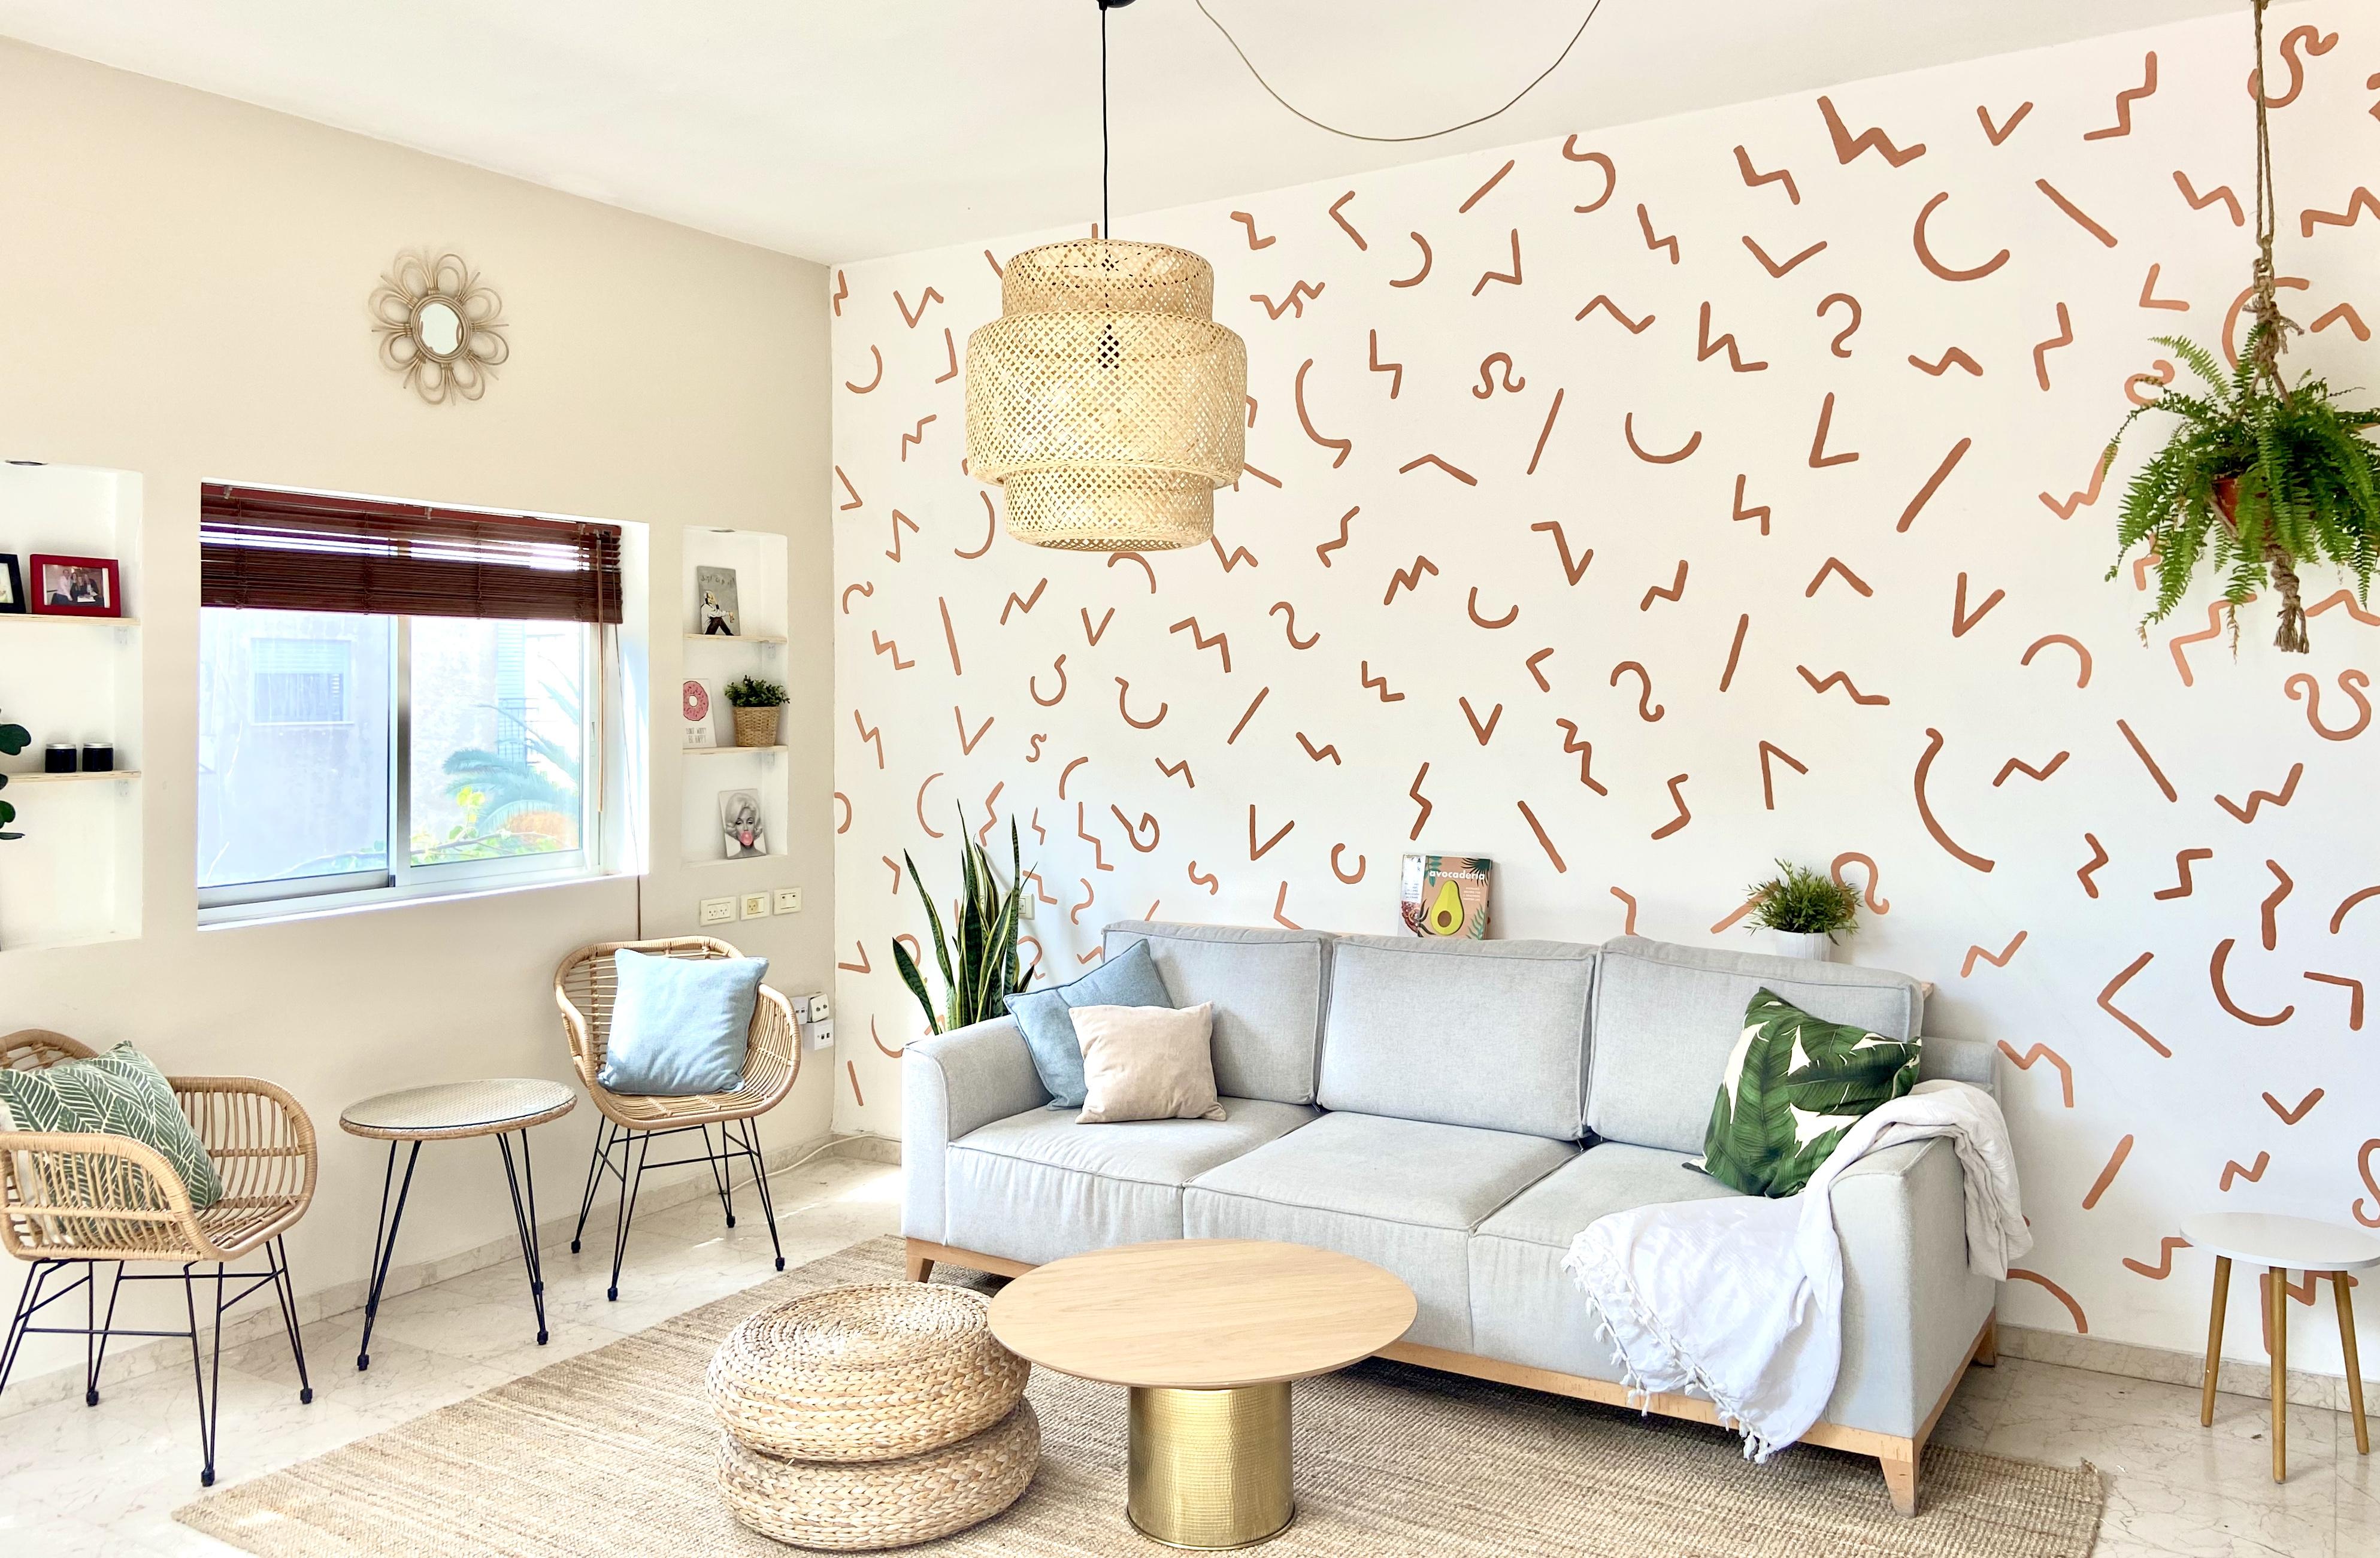 Colour ideas for home